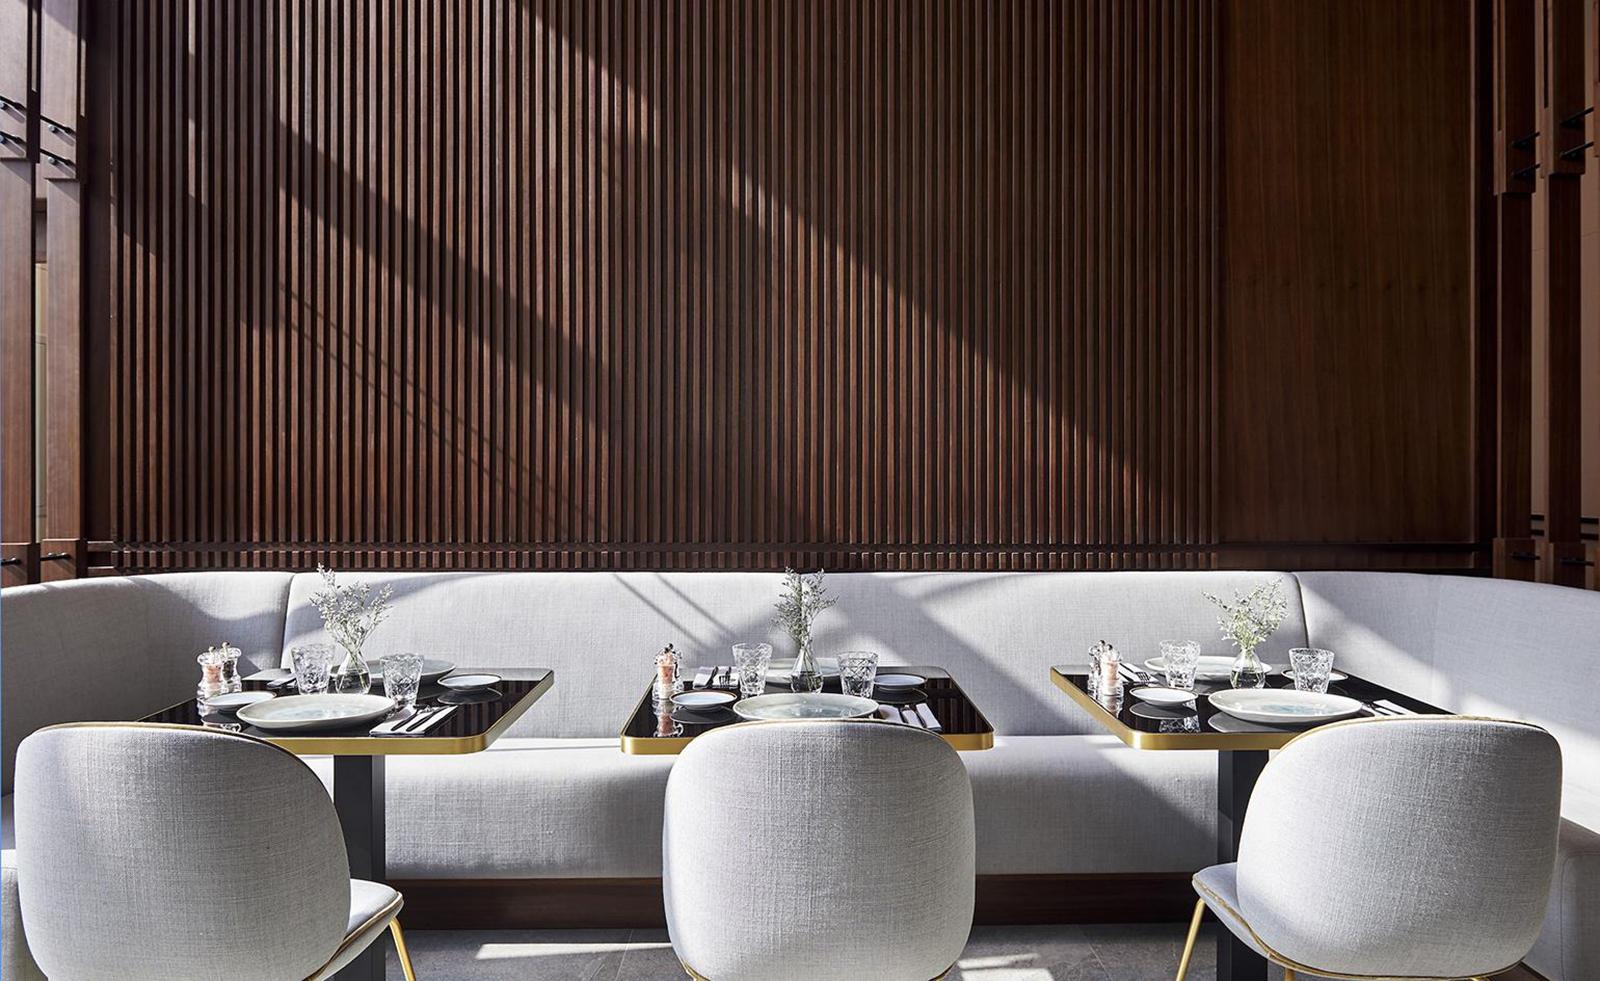 Form Hotel restaurant interior